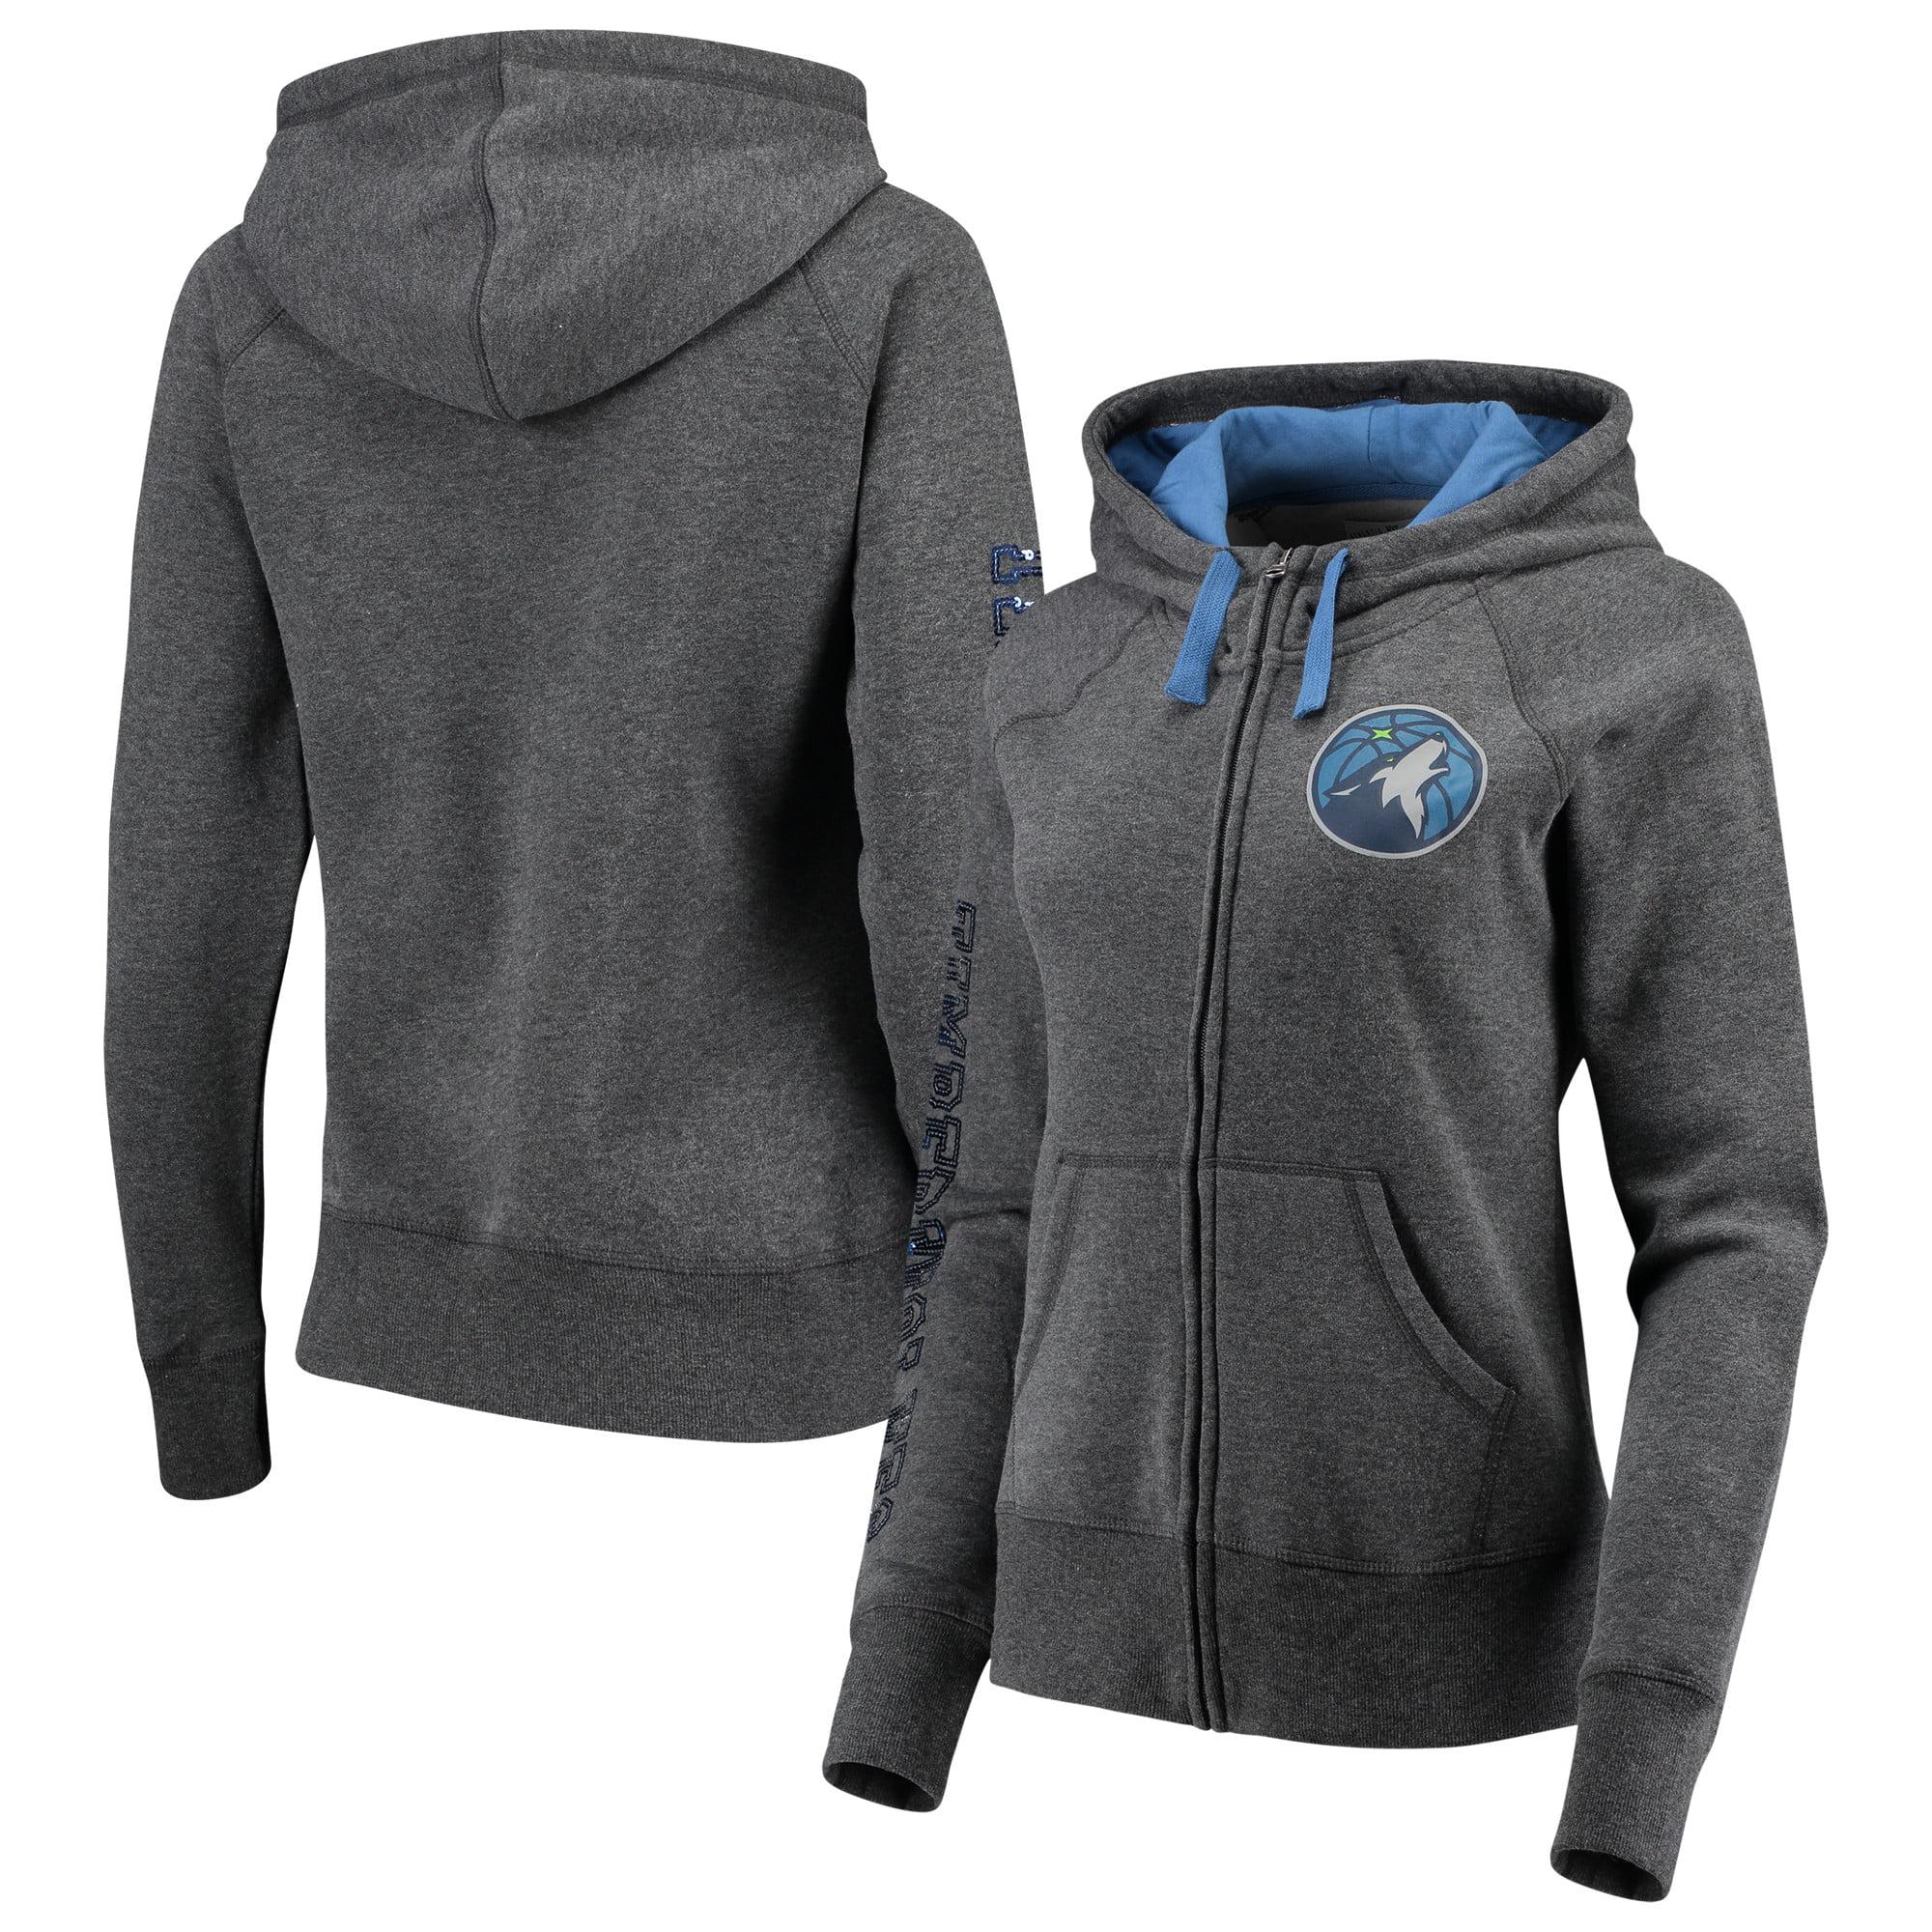 Minnesota Timberwolves G-III 4Her by Carl Banks Women's Playoff Suede Fleece Full-Zip Jacket - Charcoal/Blue